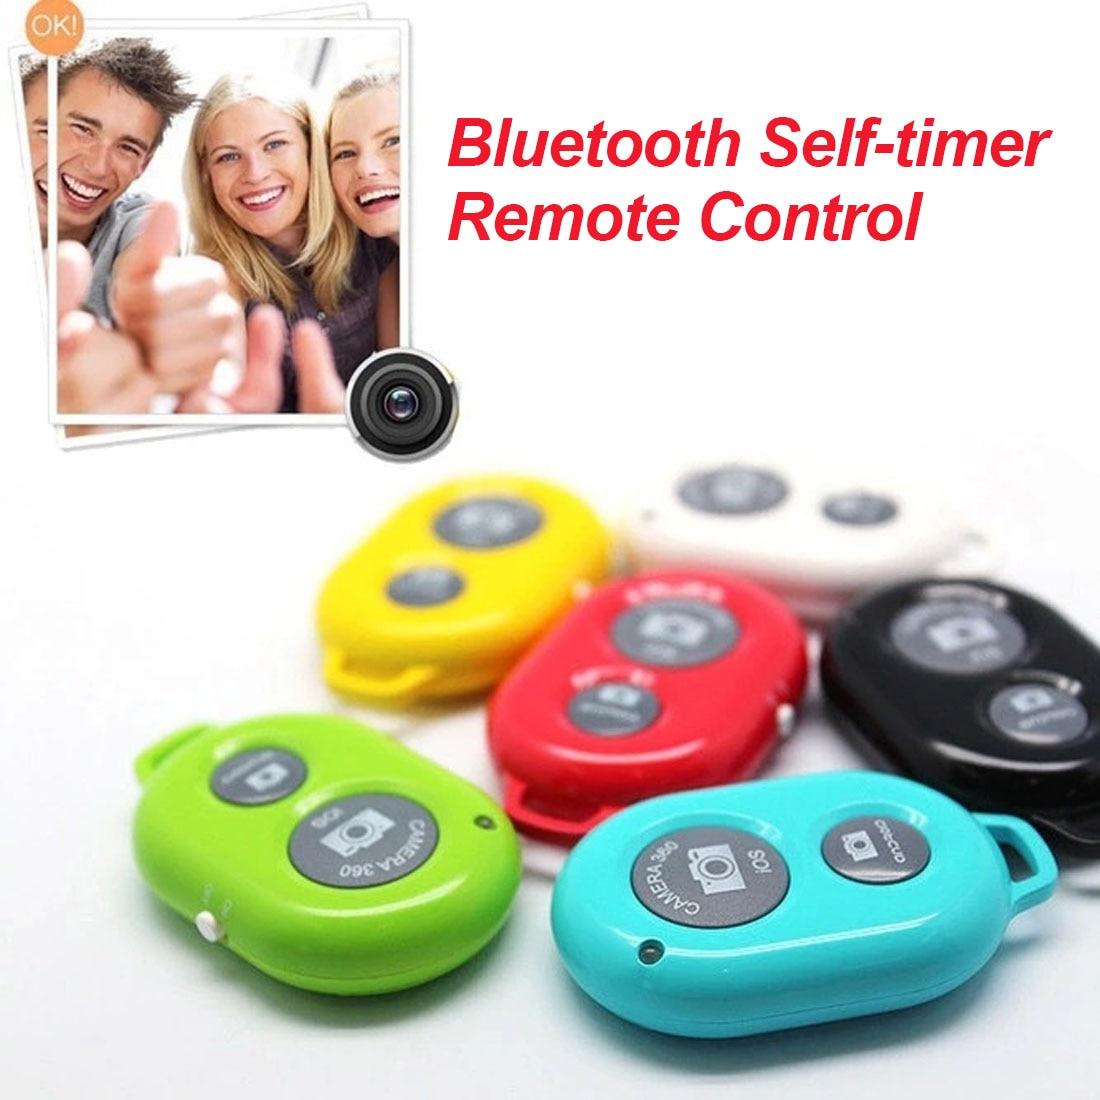 Obturador de cámara remoto Bluetooth inalámbrico centechia obturador de autofoto temporizador automático para iPhone para Samsung Android